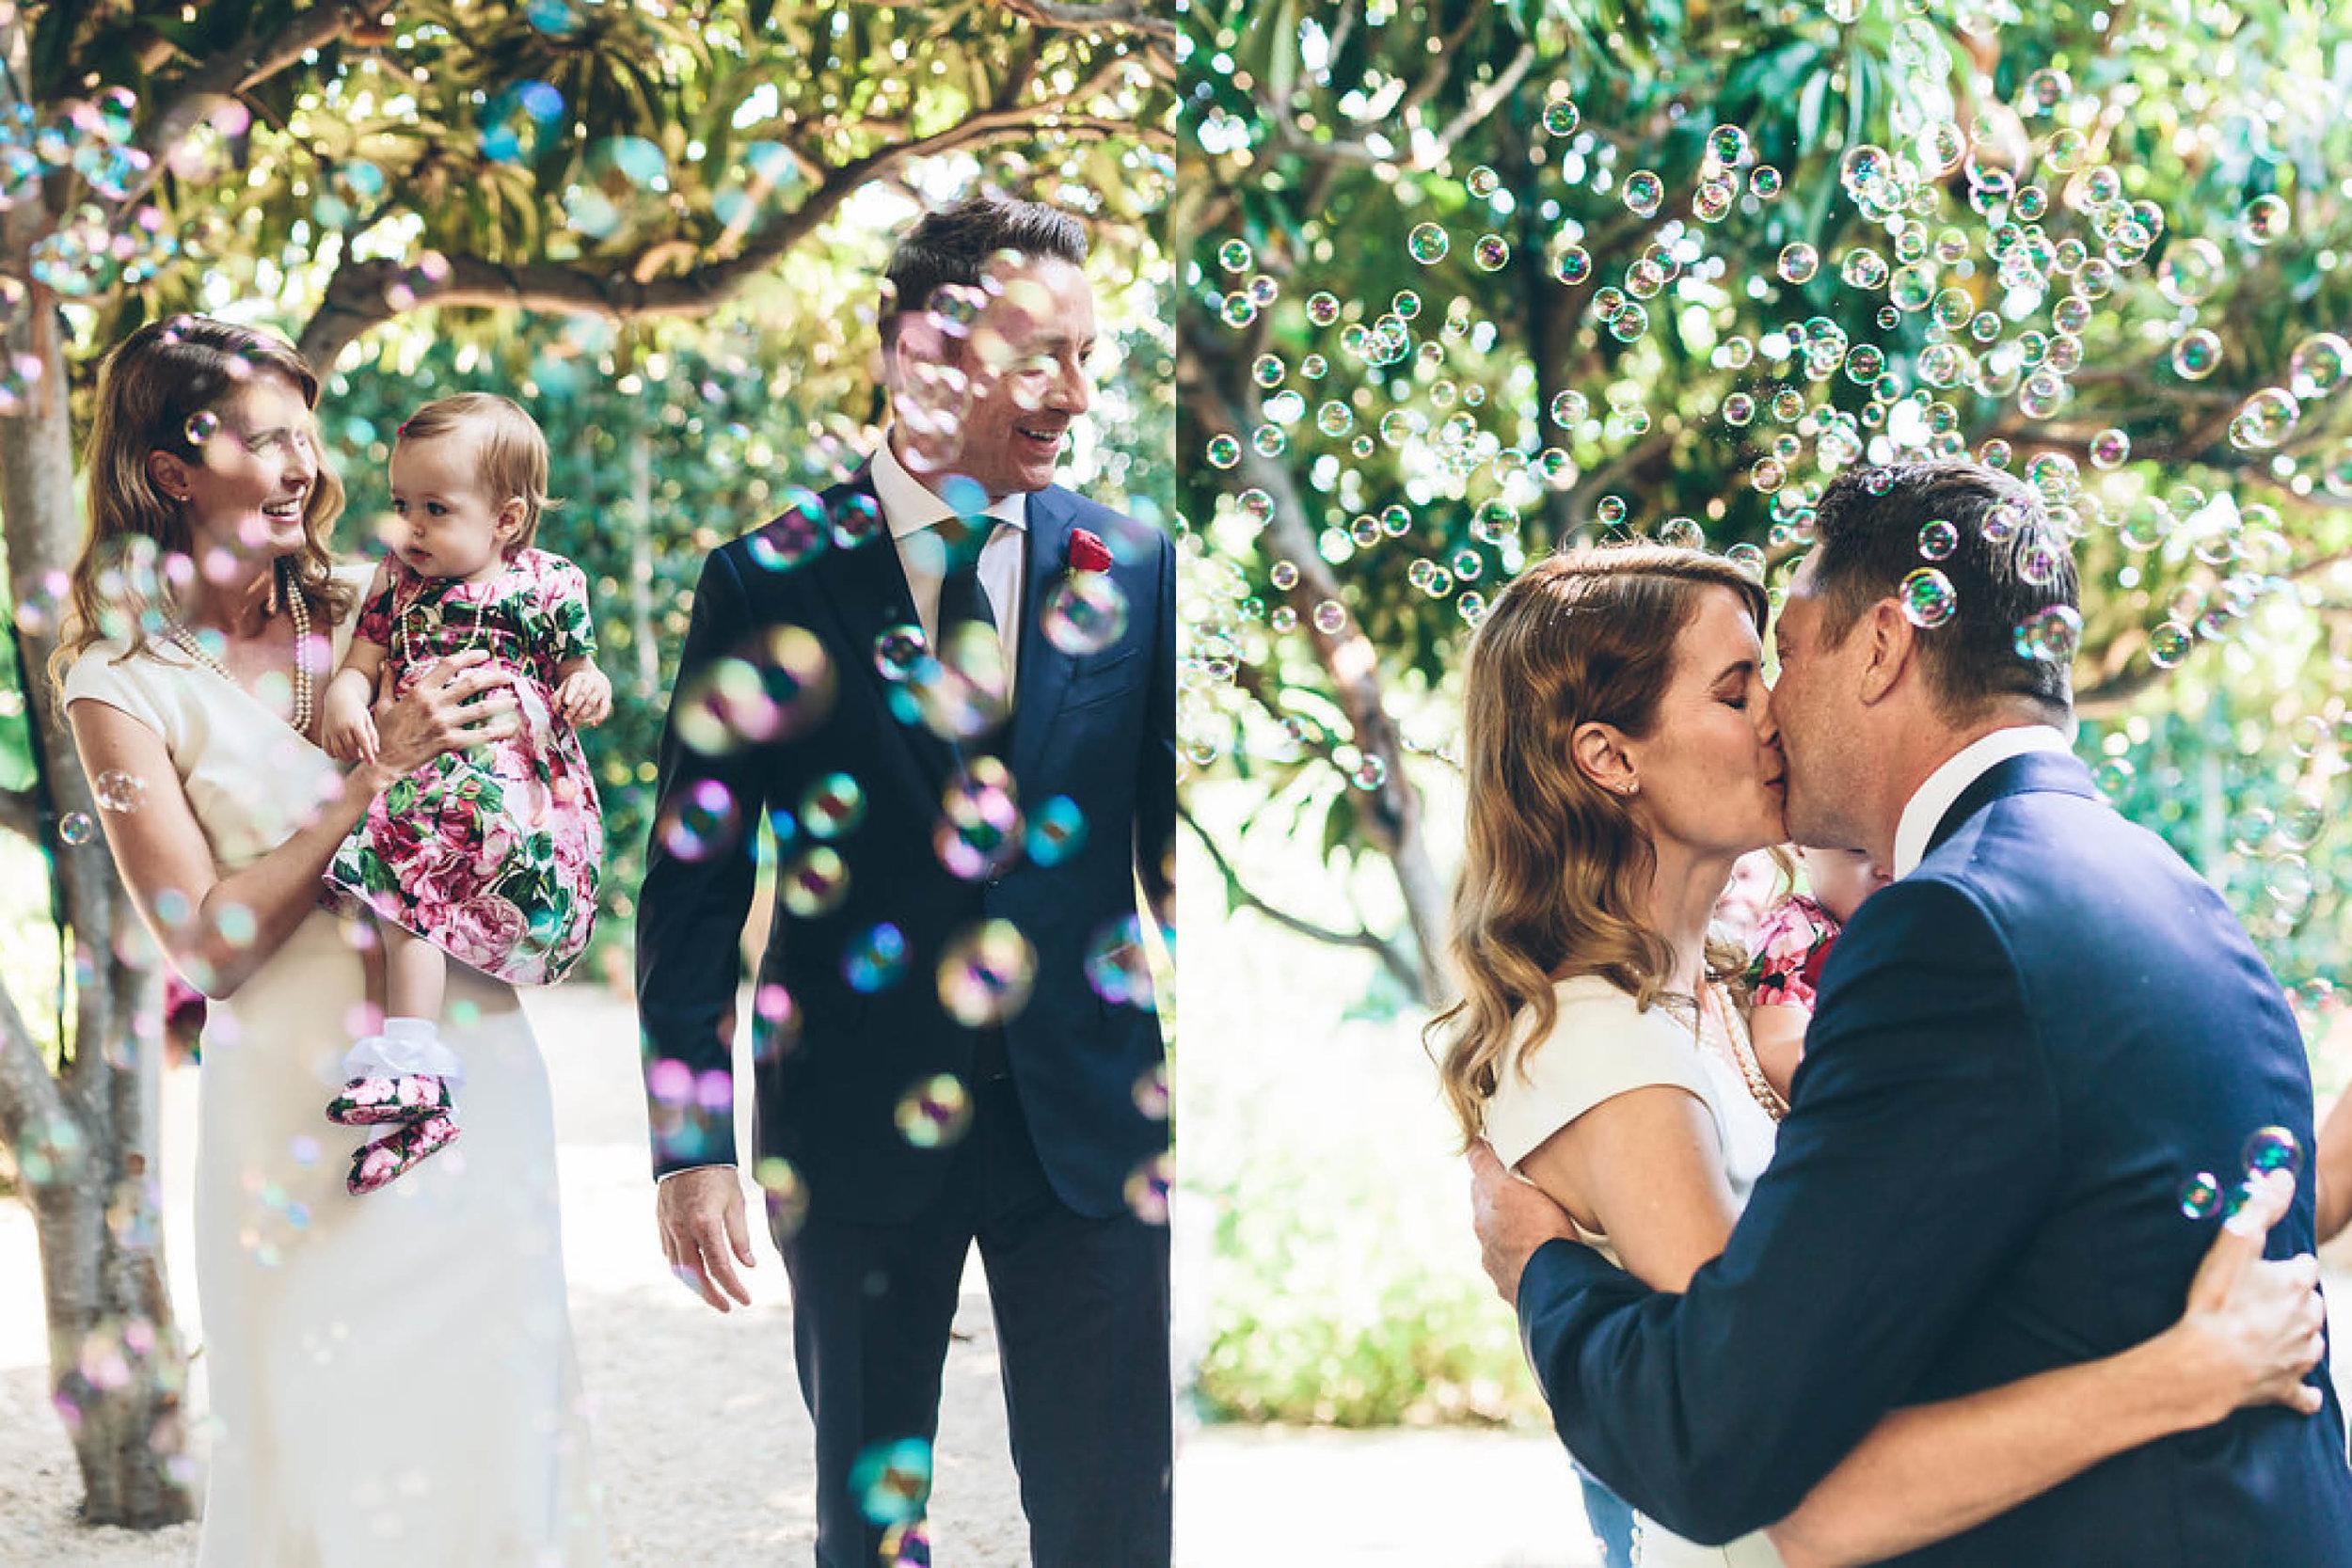 san-ysidro-ranch-wedding-elope-elopement-montecito-santa-barbara-planner-planning-coordinator-design-day-of-lavender-garden-purple-red-vintage-car-bubbles (10).jpg